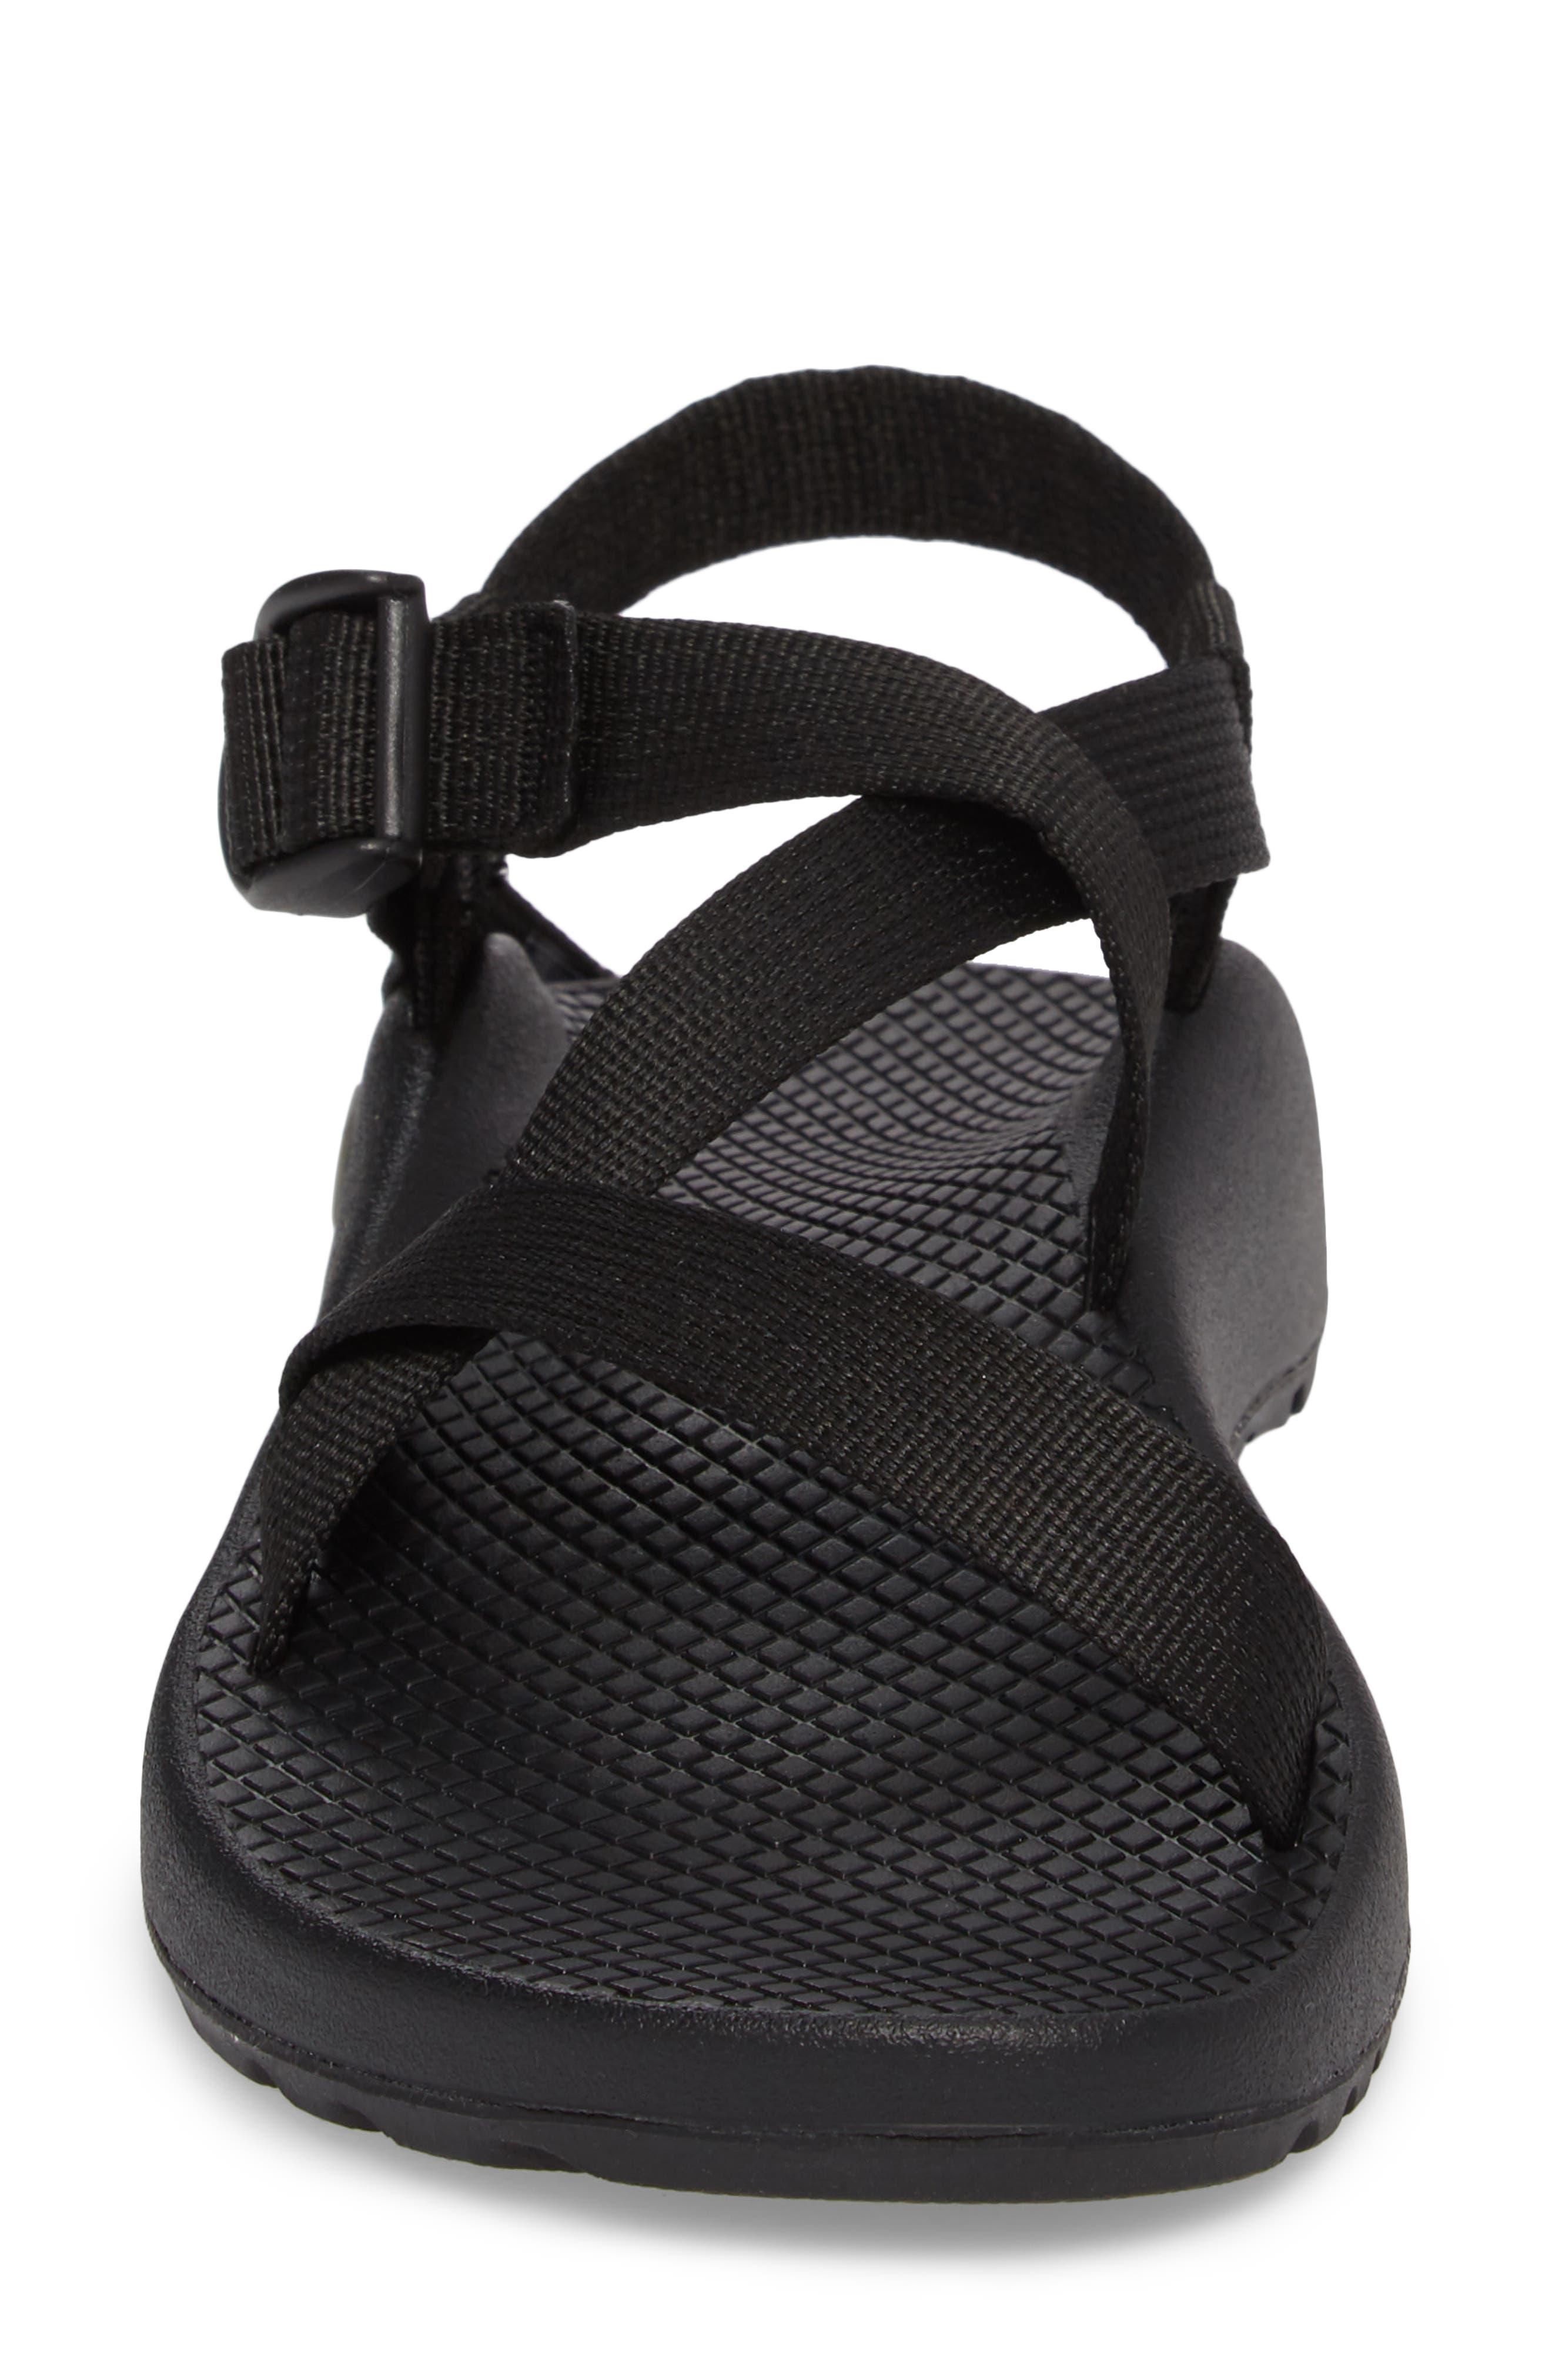 Alternate Image 4  - Chaco Z/1 Classic Sport Sandal (Women)